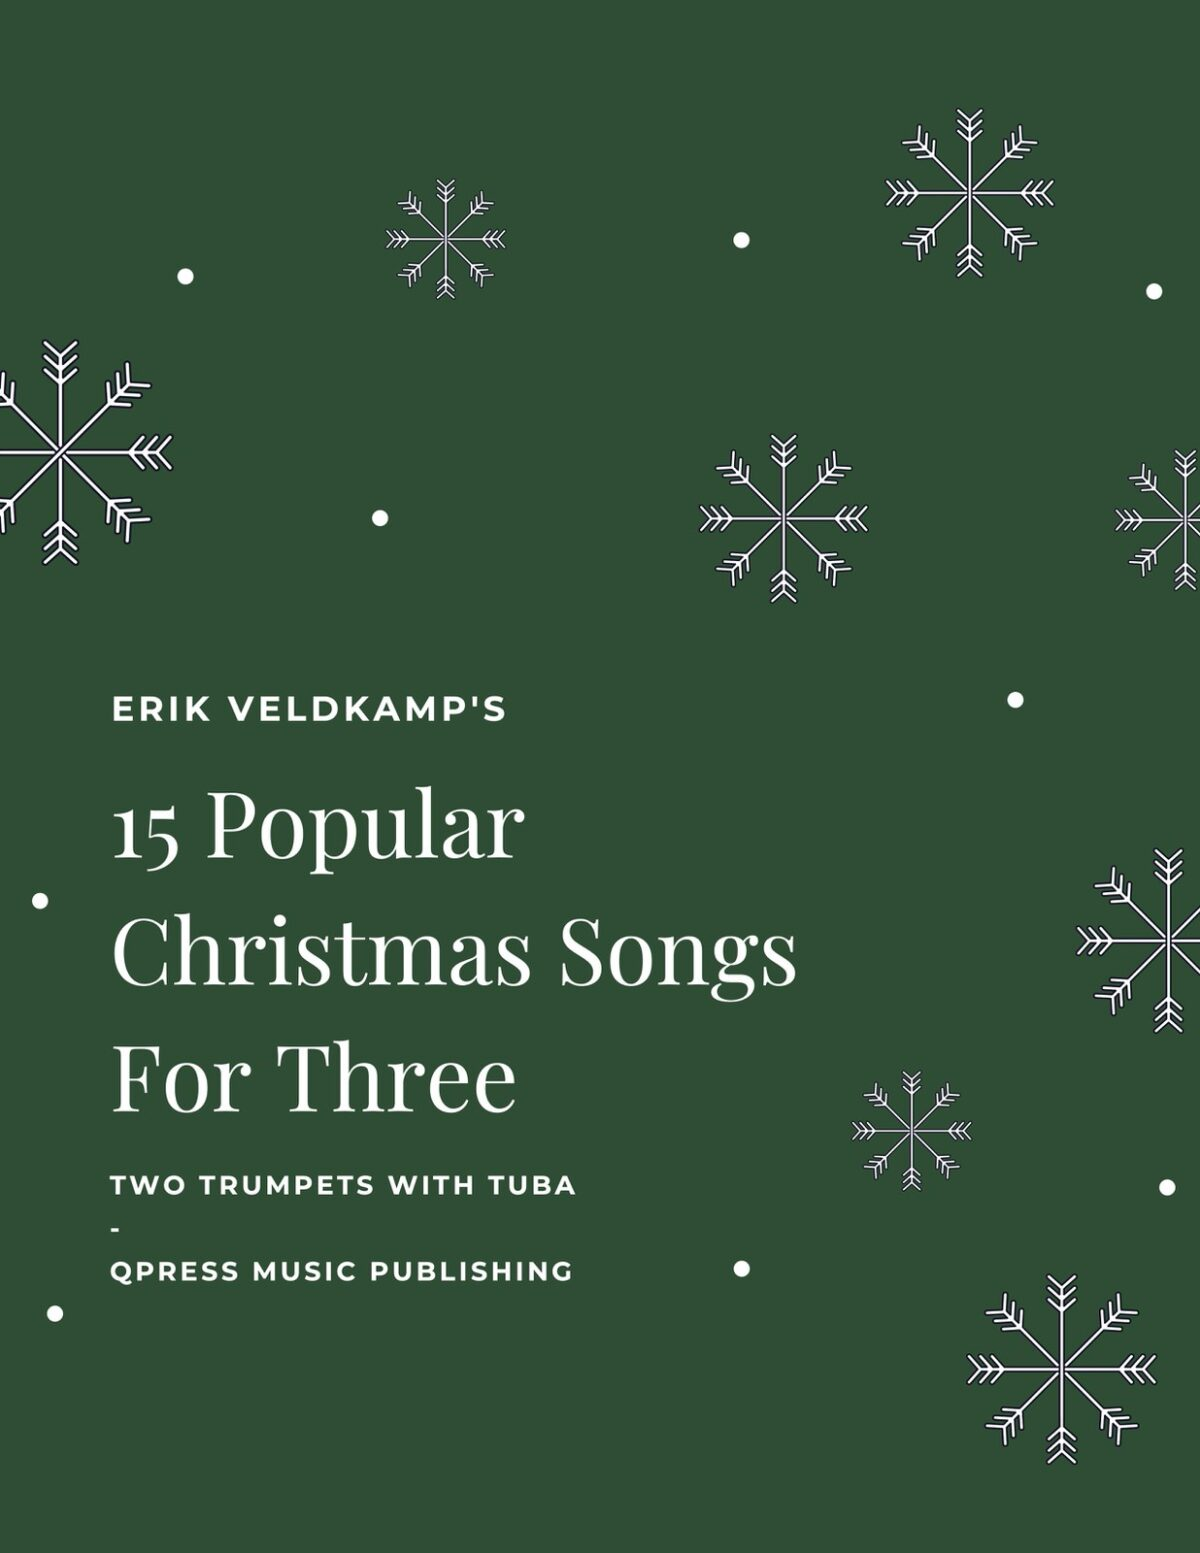 Veldkamp, 15 Popular Christmas Trios (Score)-p01